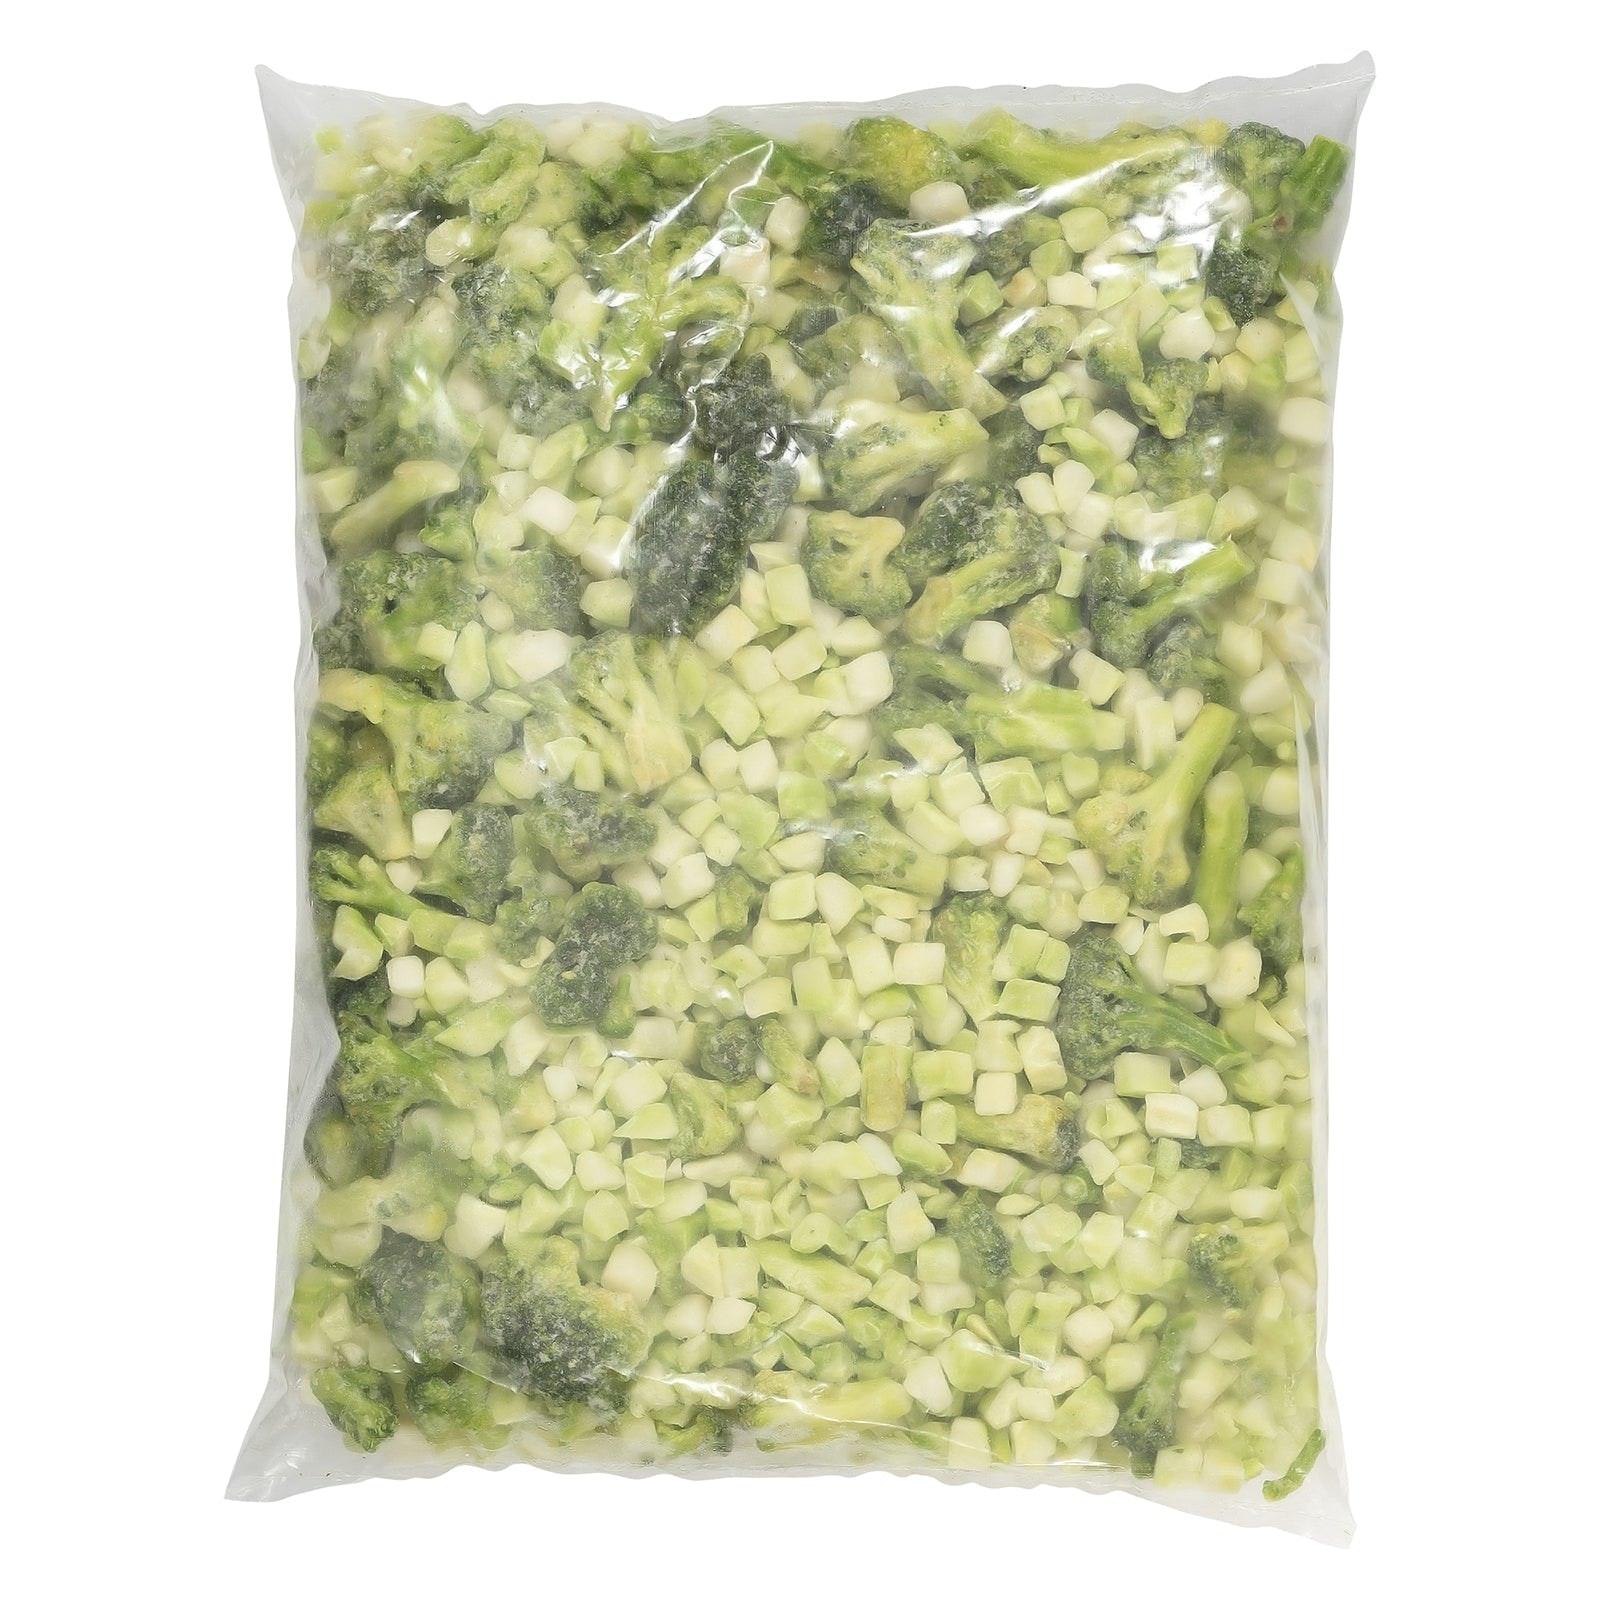 BELOW ZERO Broccoli cut